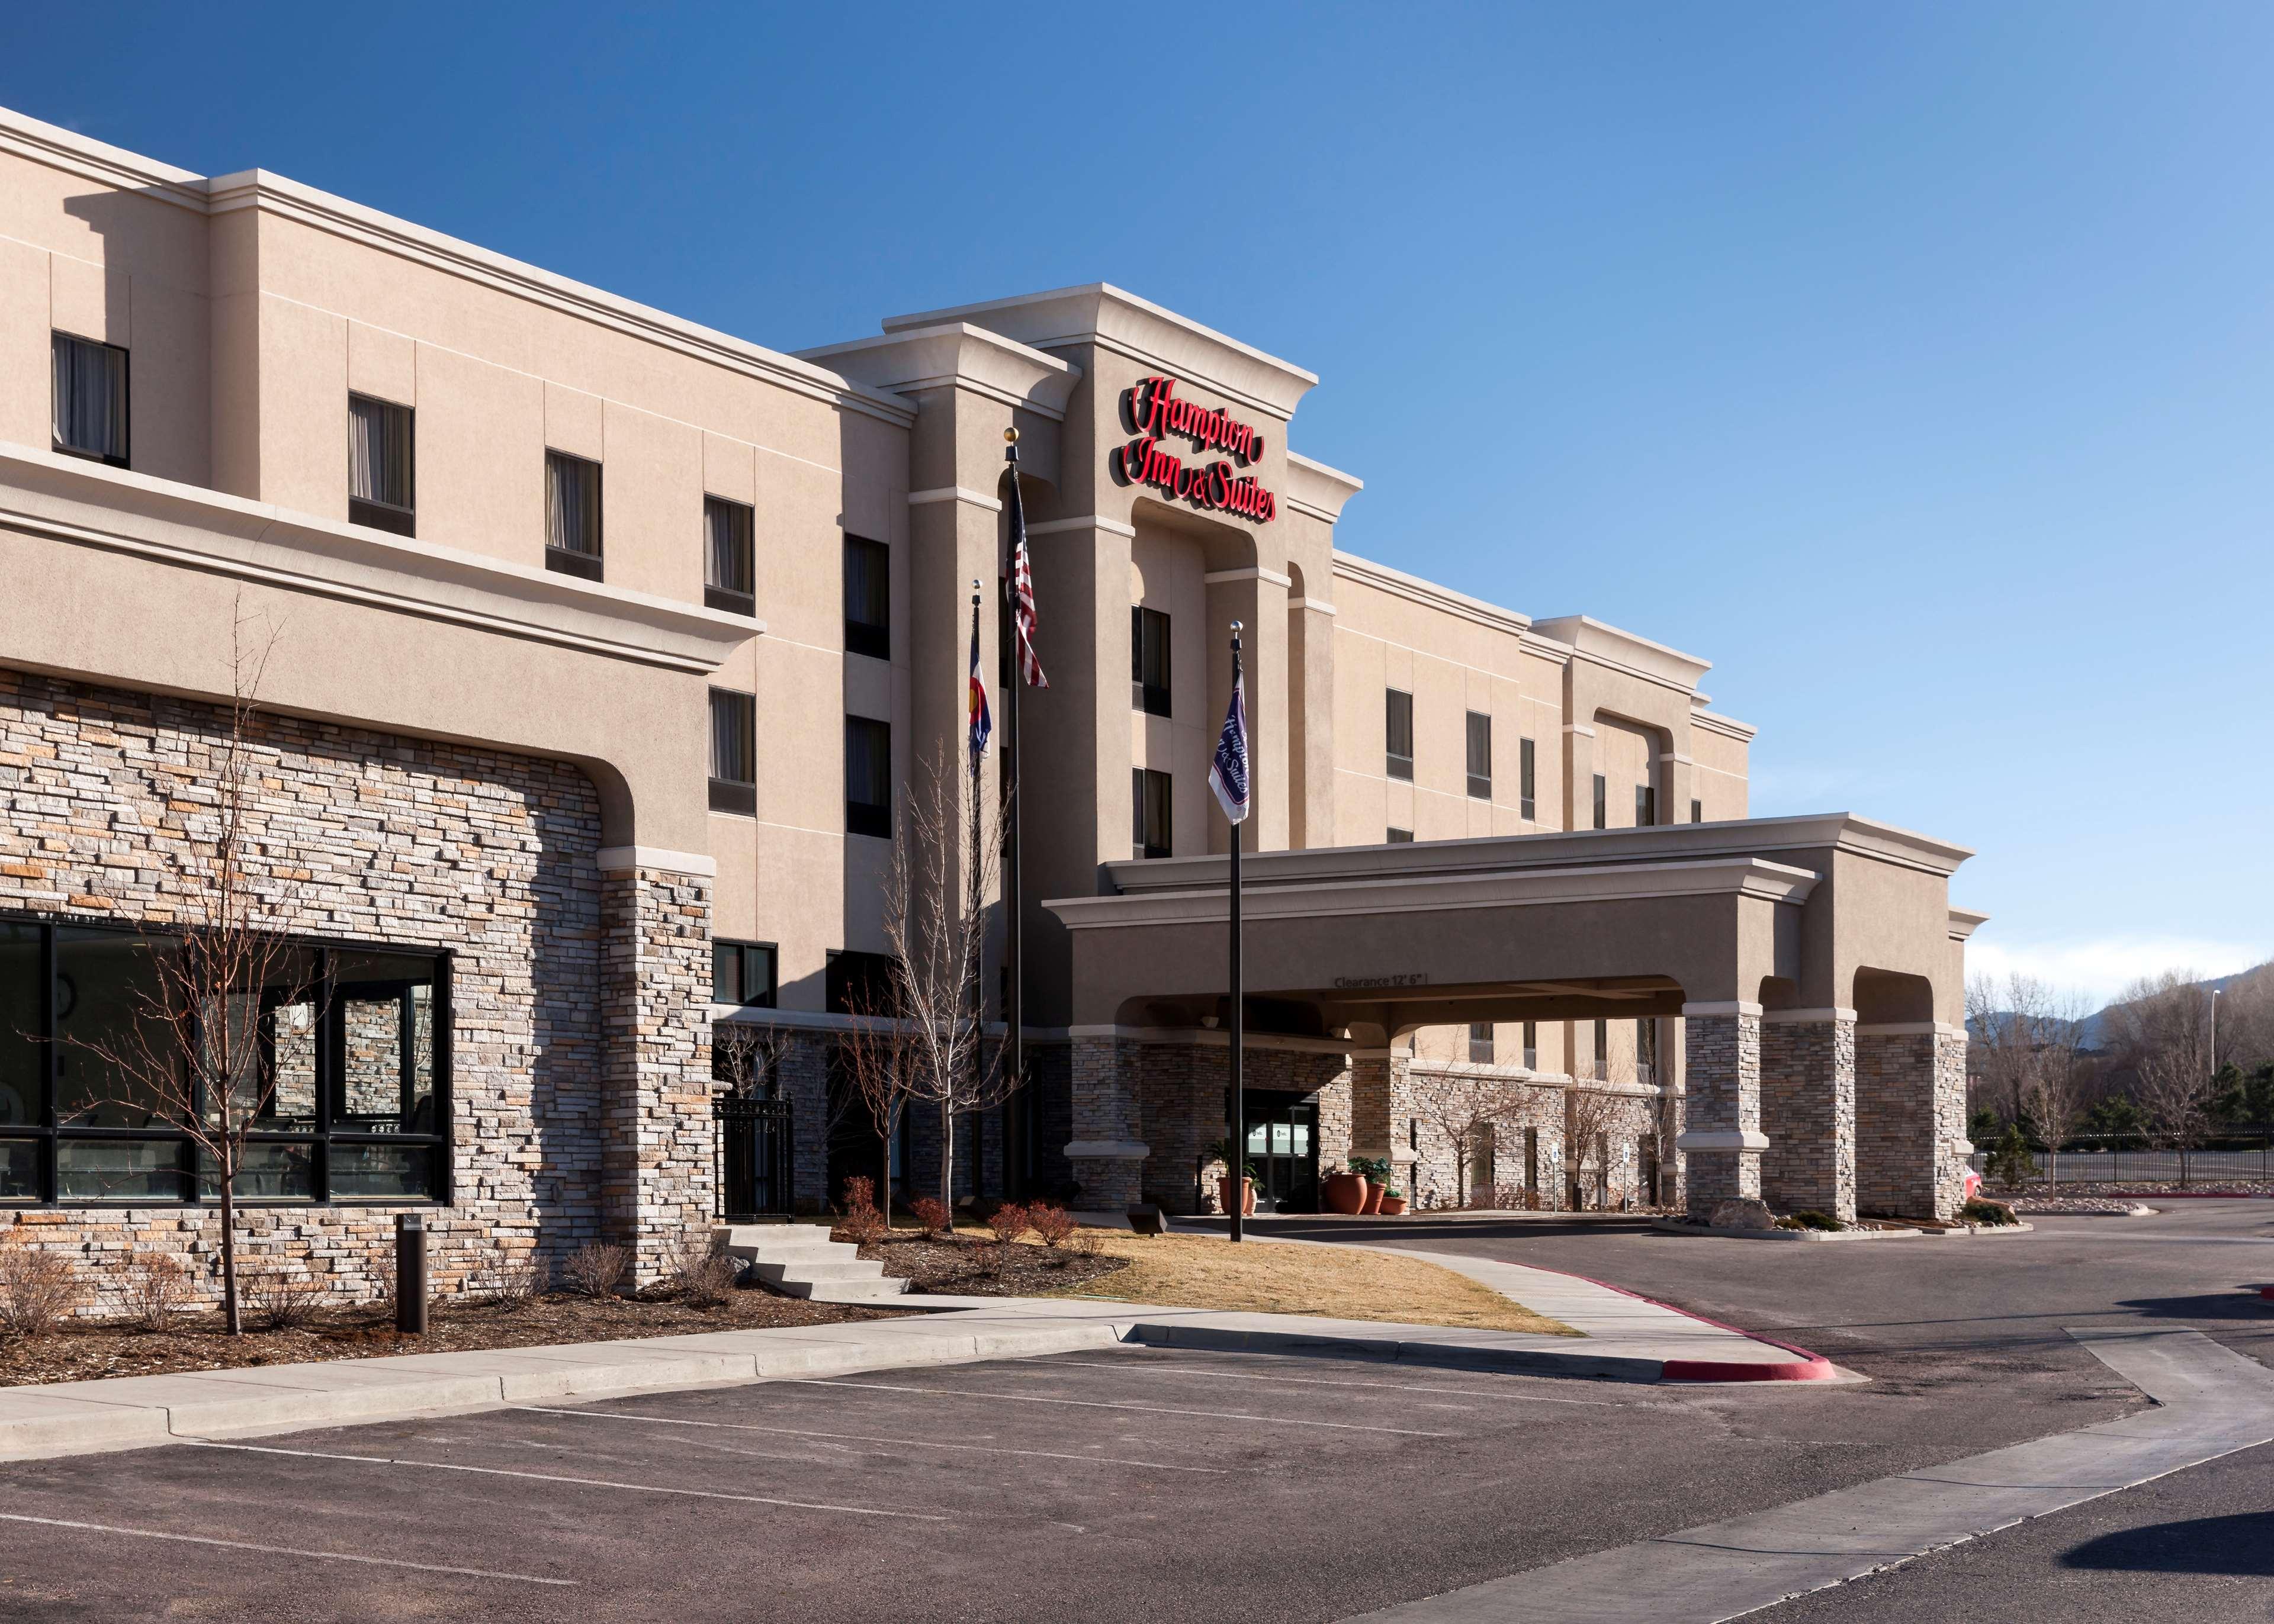 Hampton Inn & Suites Colorado Springs/I-25 South